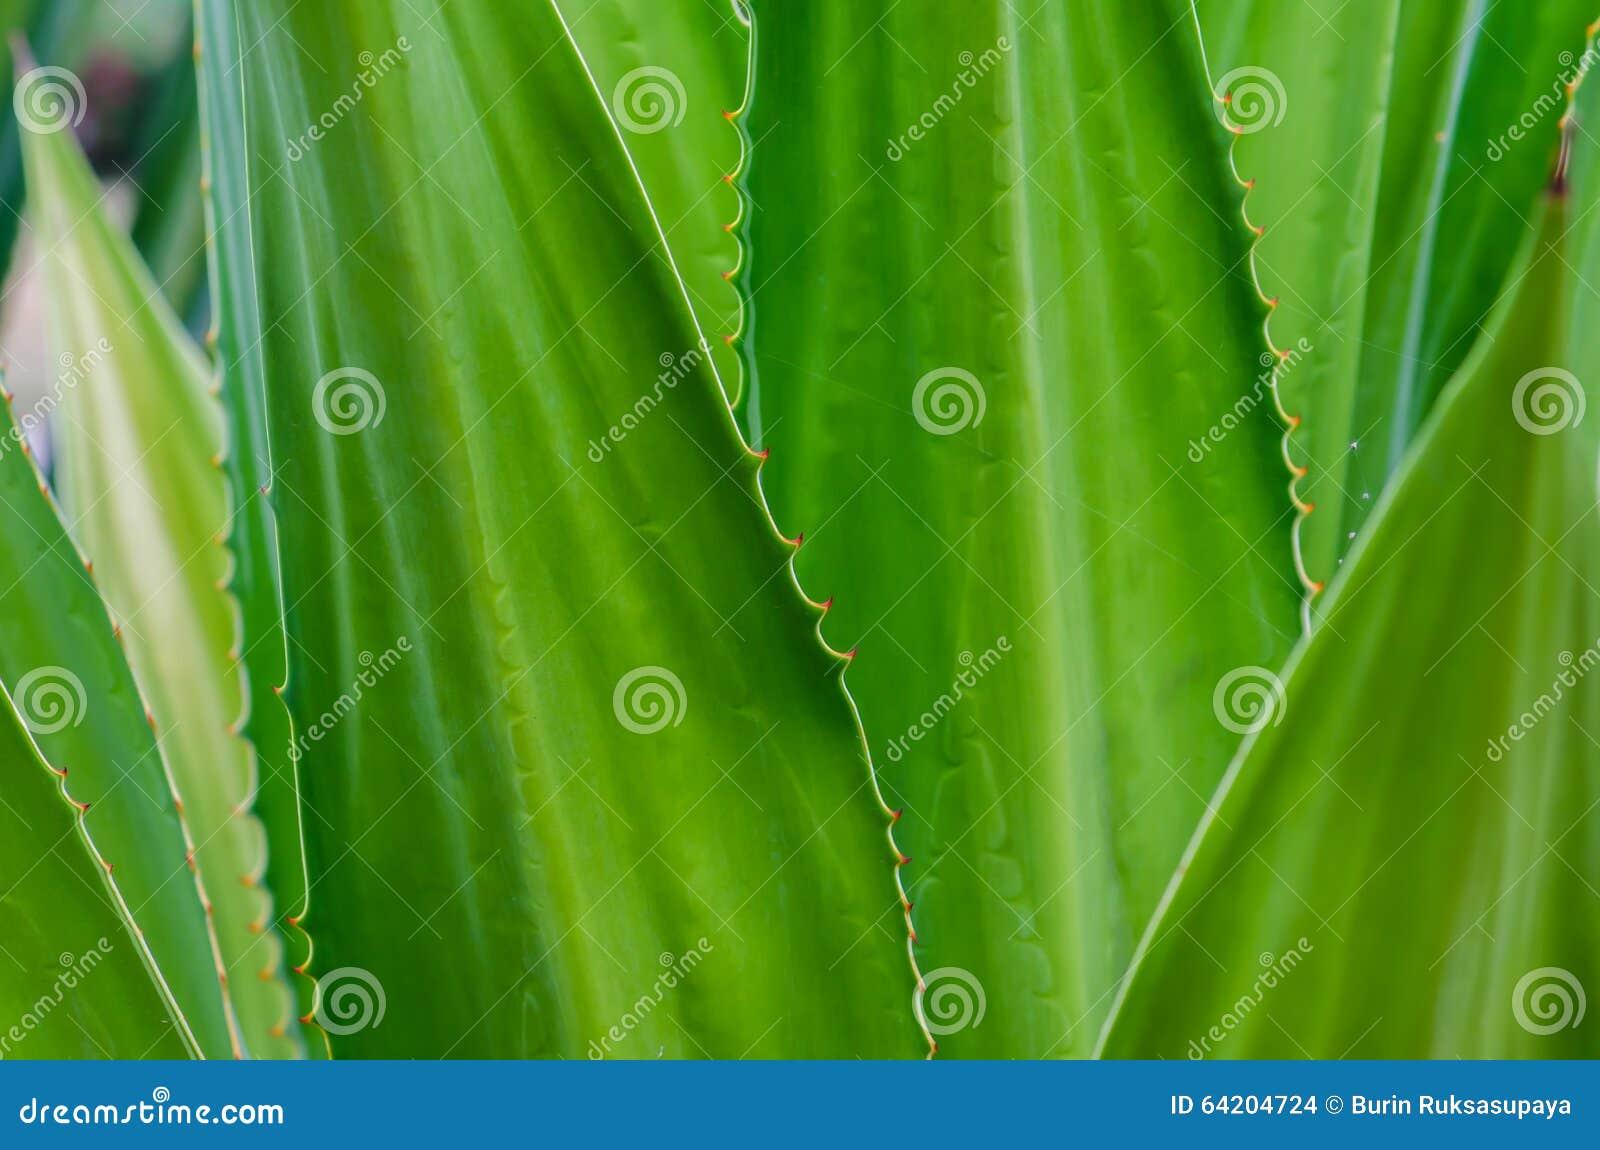 Agaveceae nombrado cactus